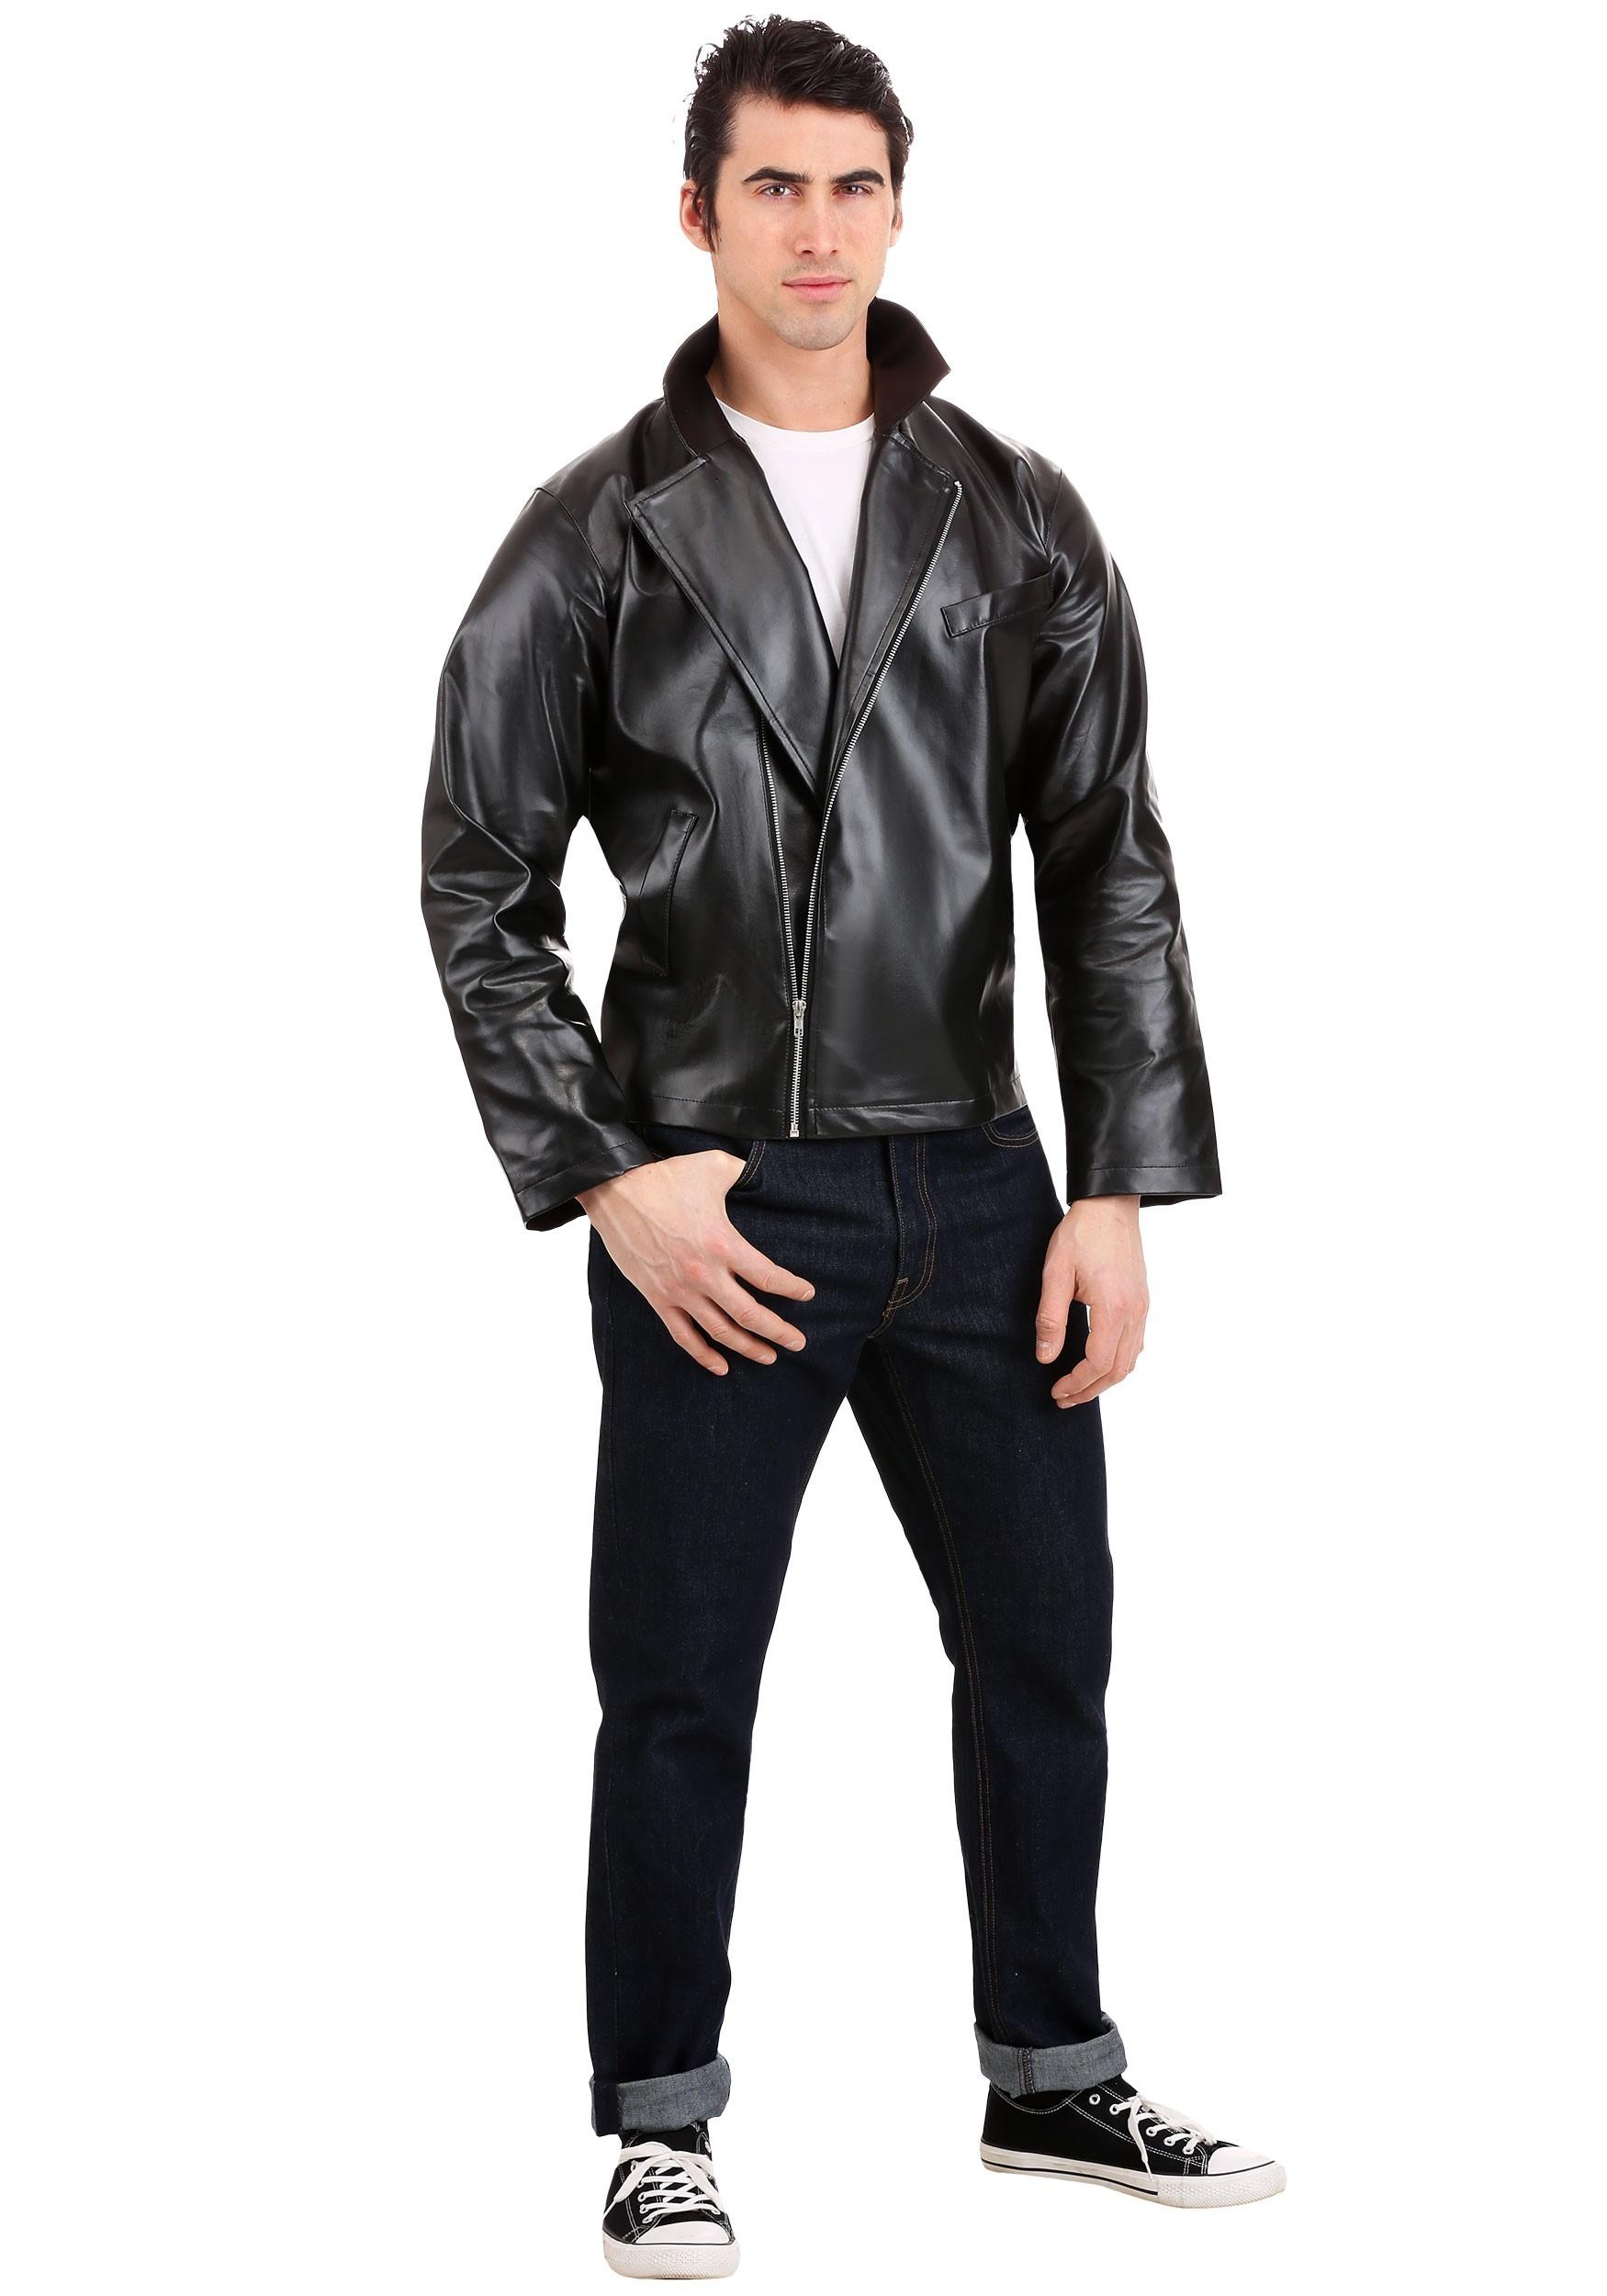 Grease T-Birds Jacket Costume for Men